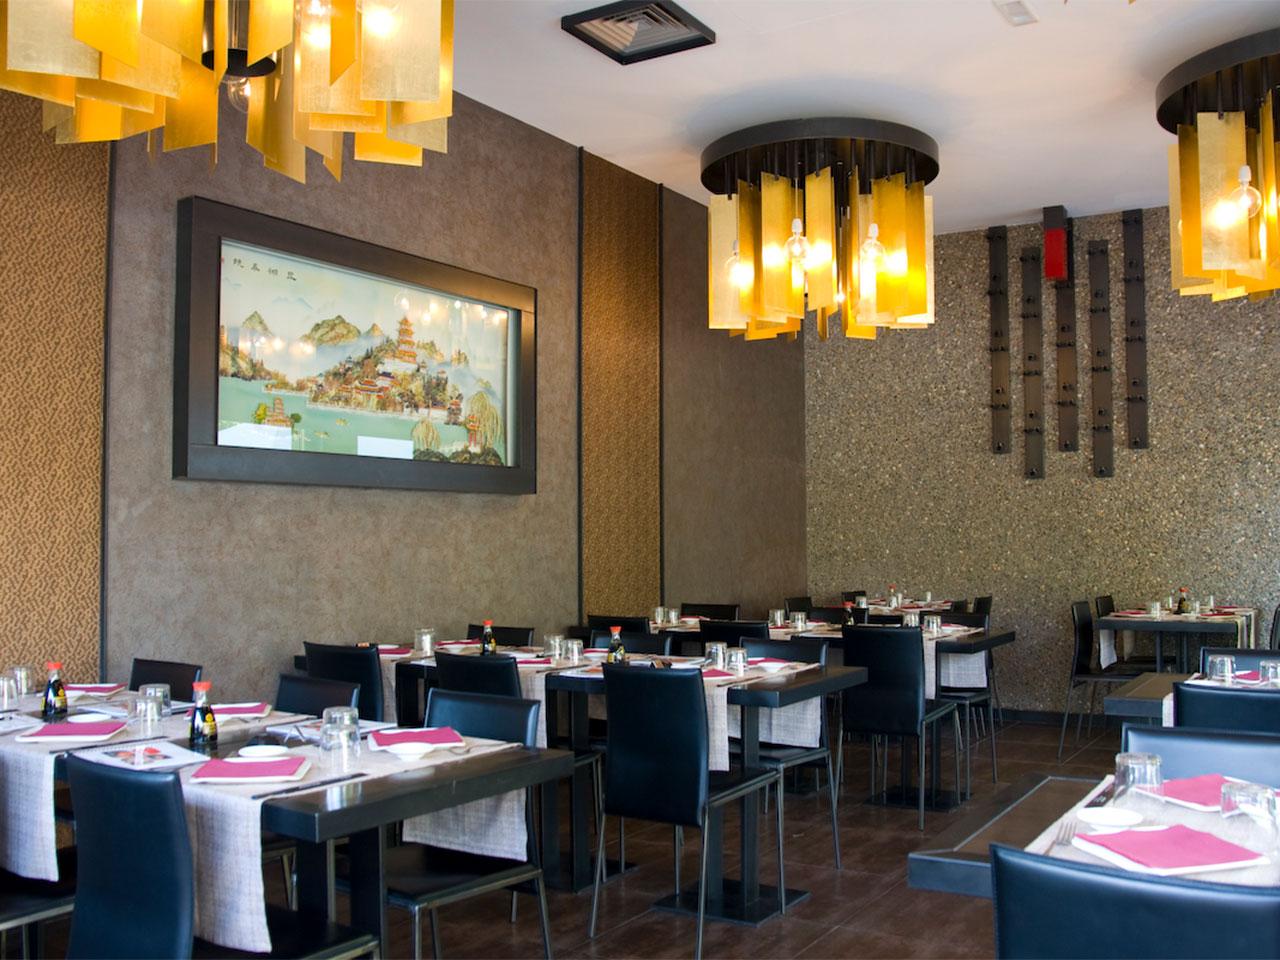 ristorante-giapponese-hiro-japanese-restaurant-mazzo-di-rho-14